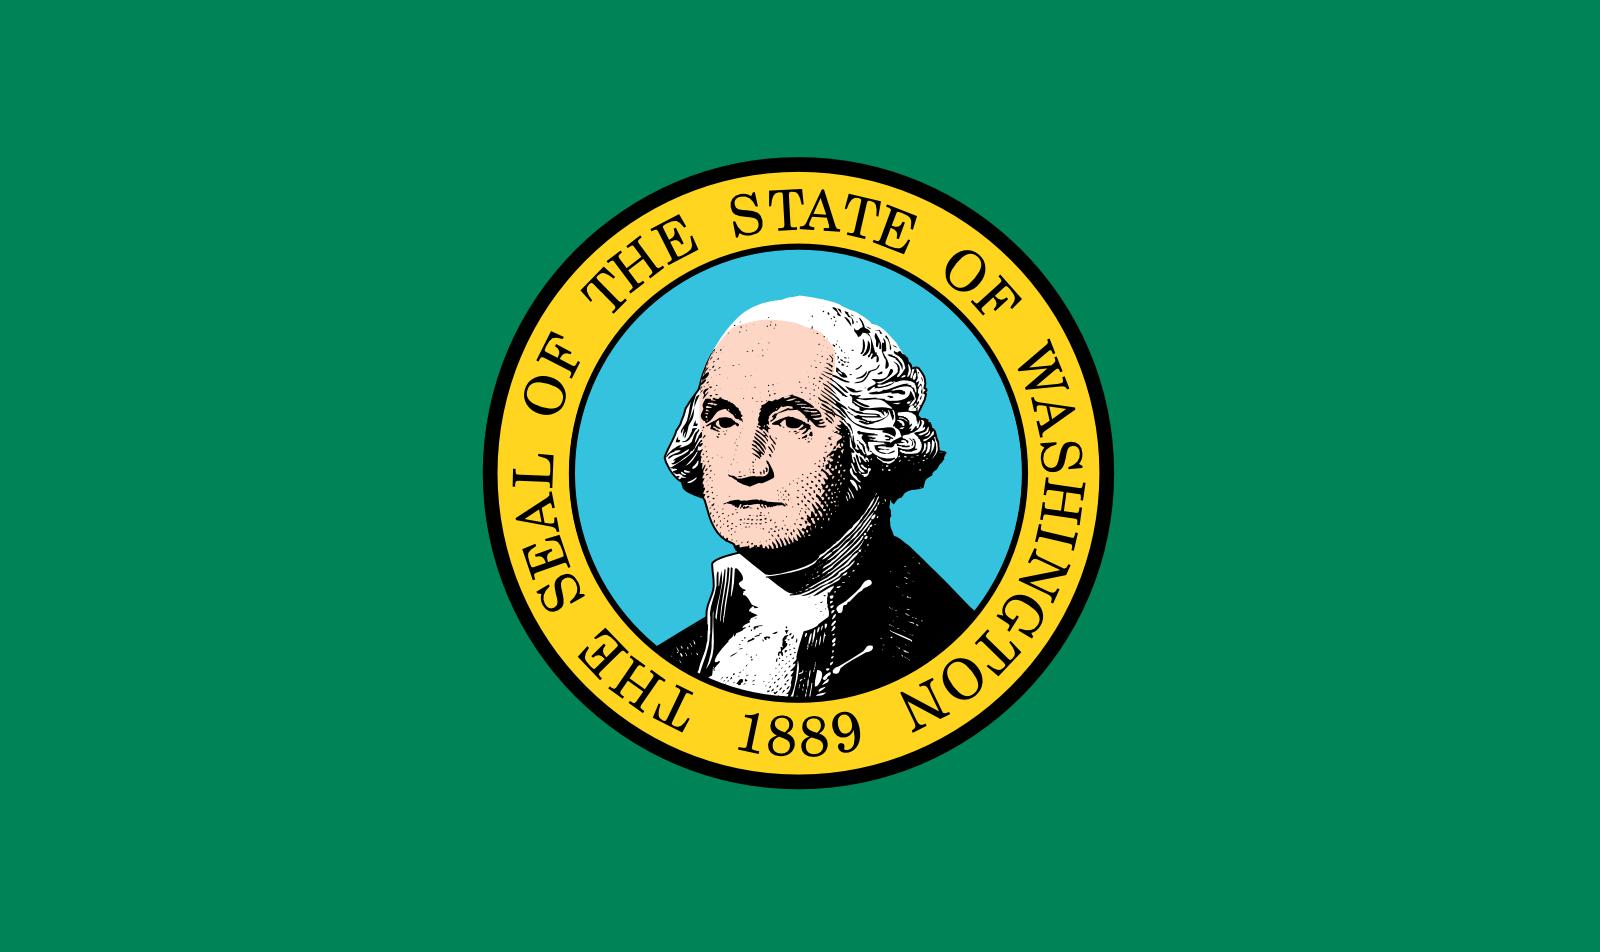 Who is the patron saint of Washington?